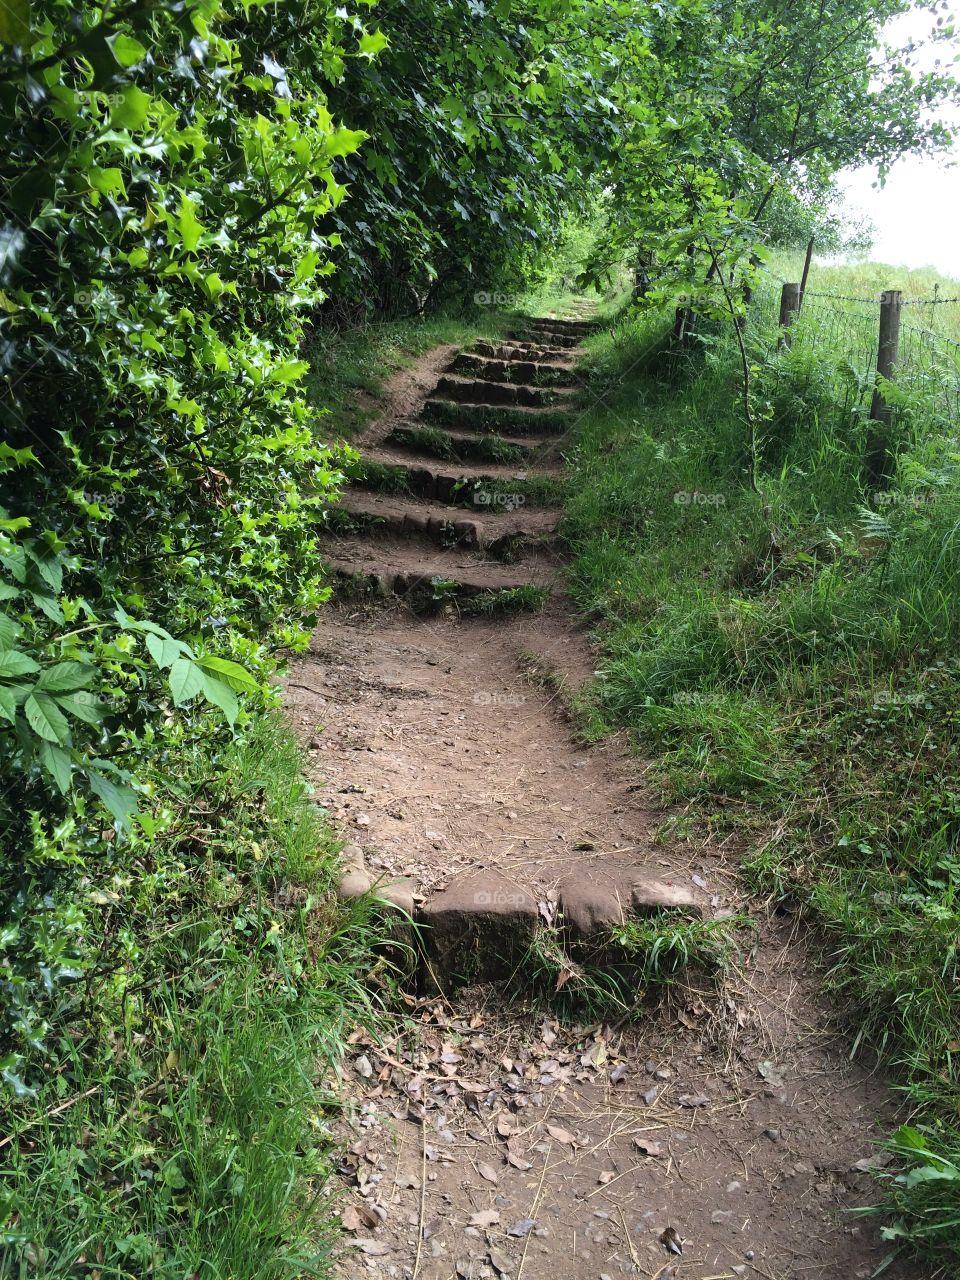 Steps. Well worn steps